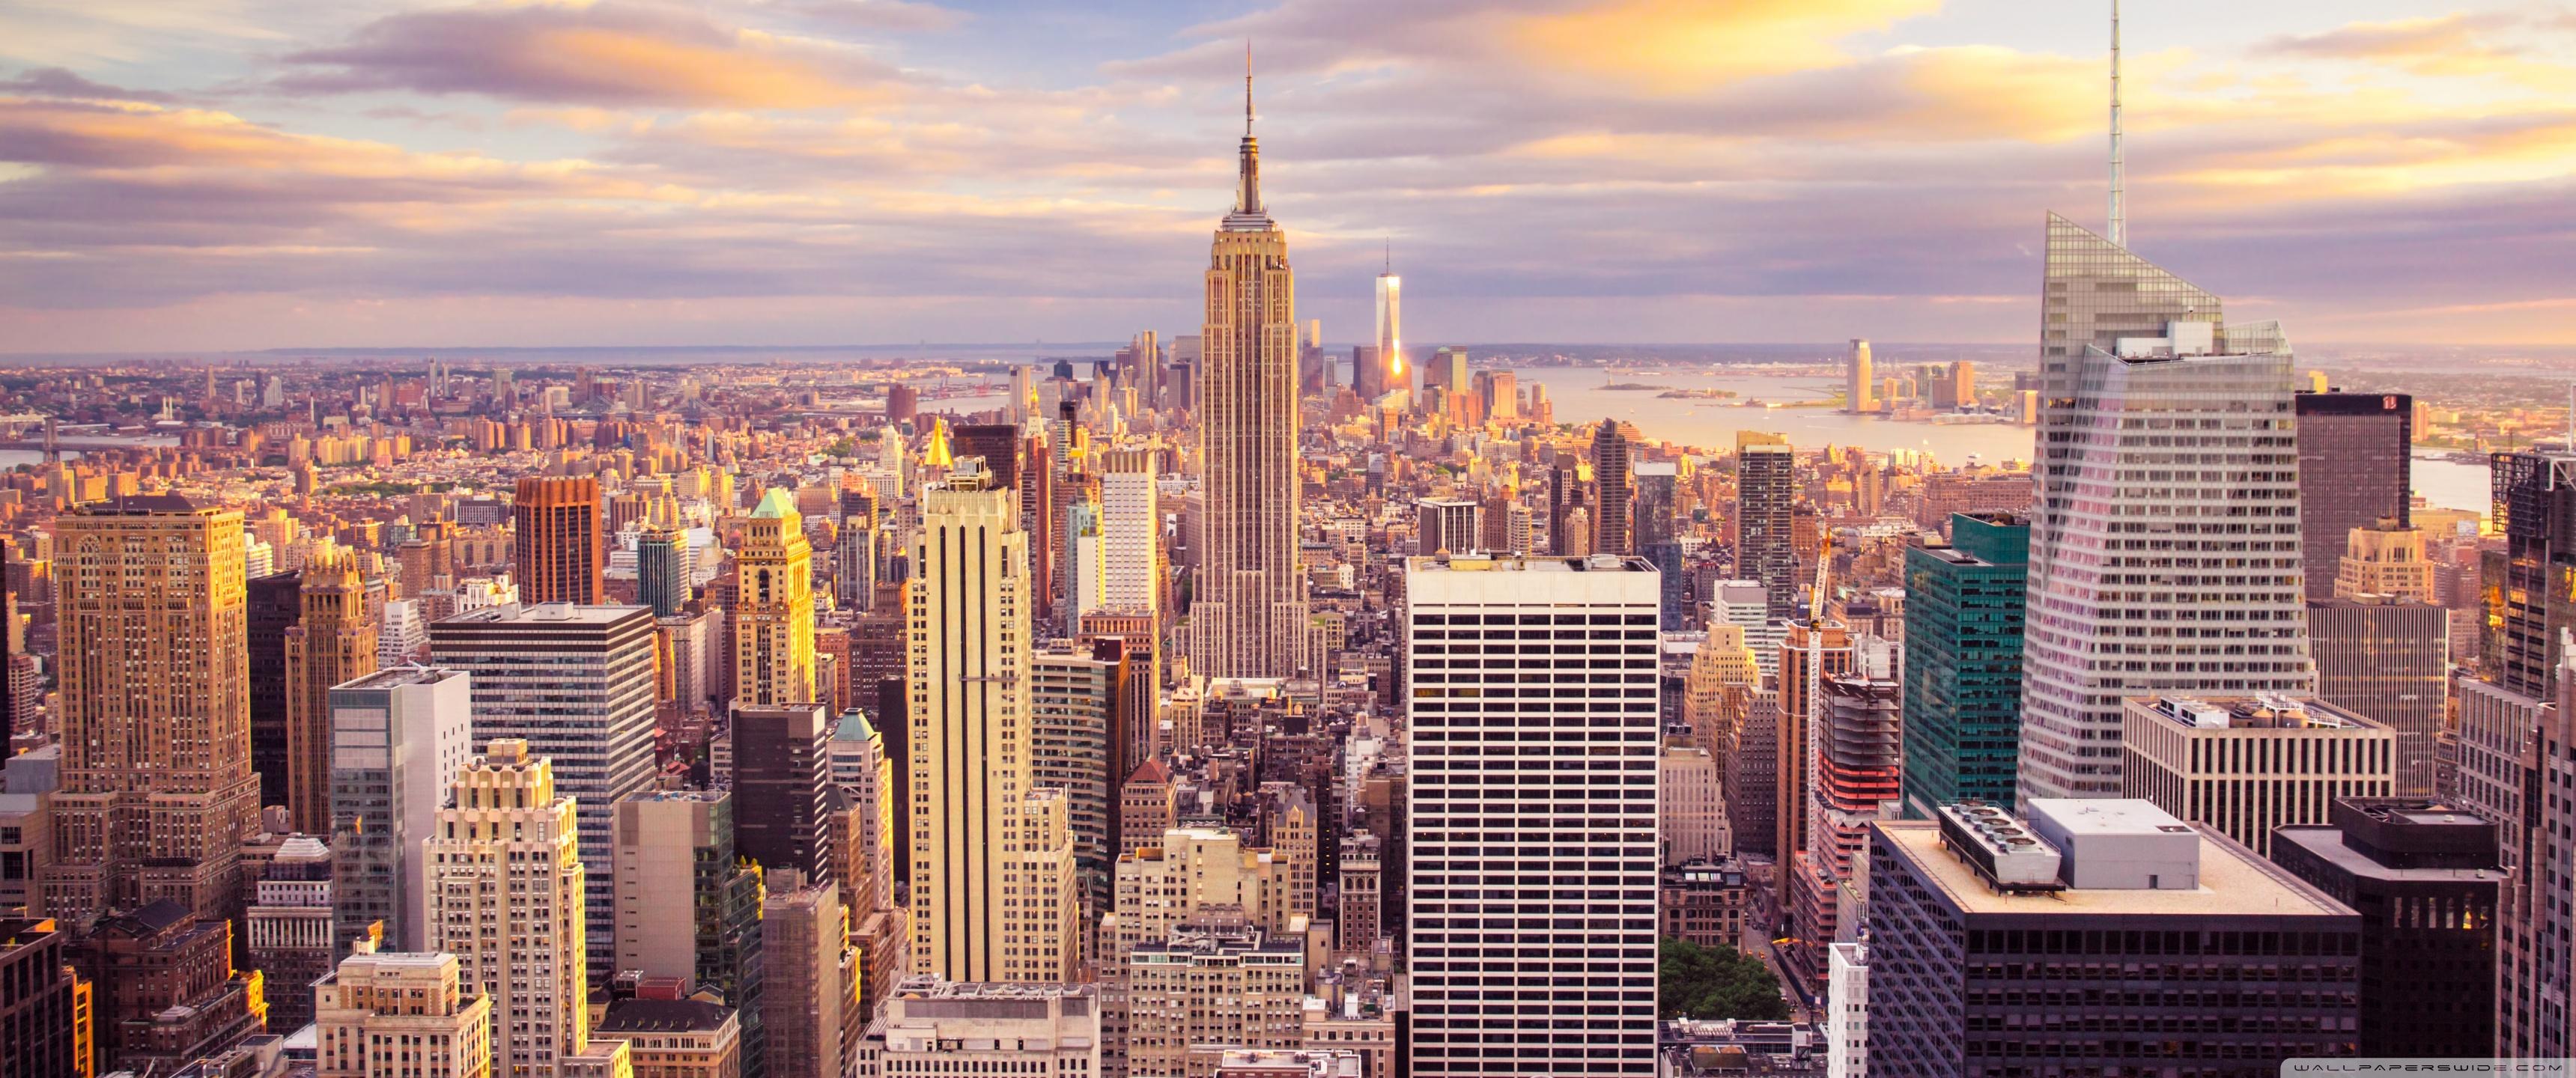 New York City Buildings 4K HD Desktop Wallpaper for 4K Ultra HD